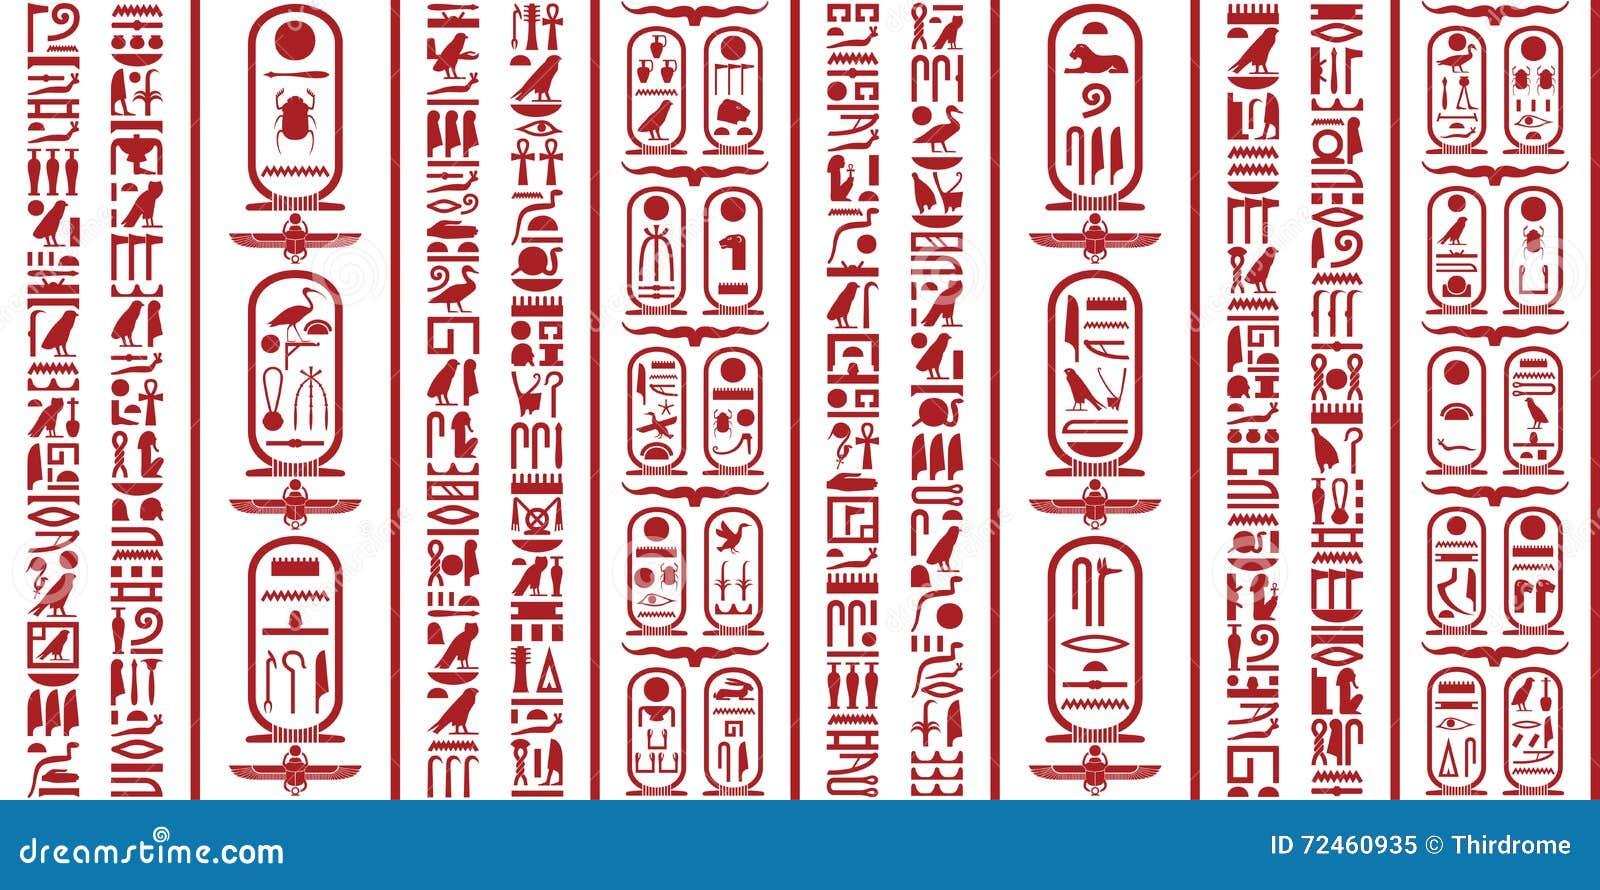 Ancient egyptian symbols and decorations stock vector egyptian hieroglyphic writing set 1 royalty free stock photo biocorpaavc